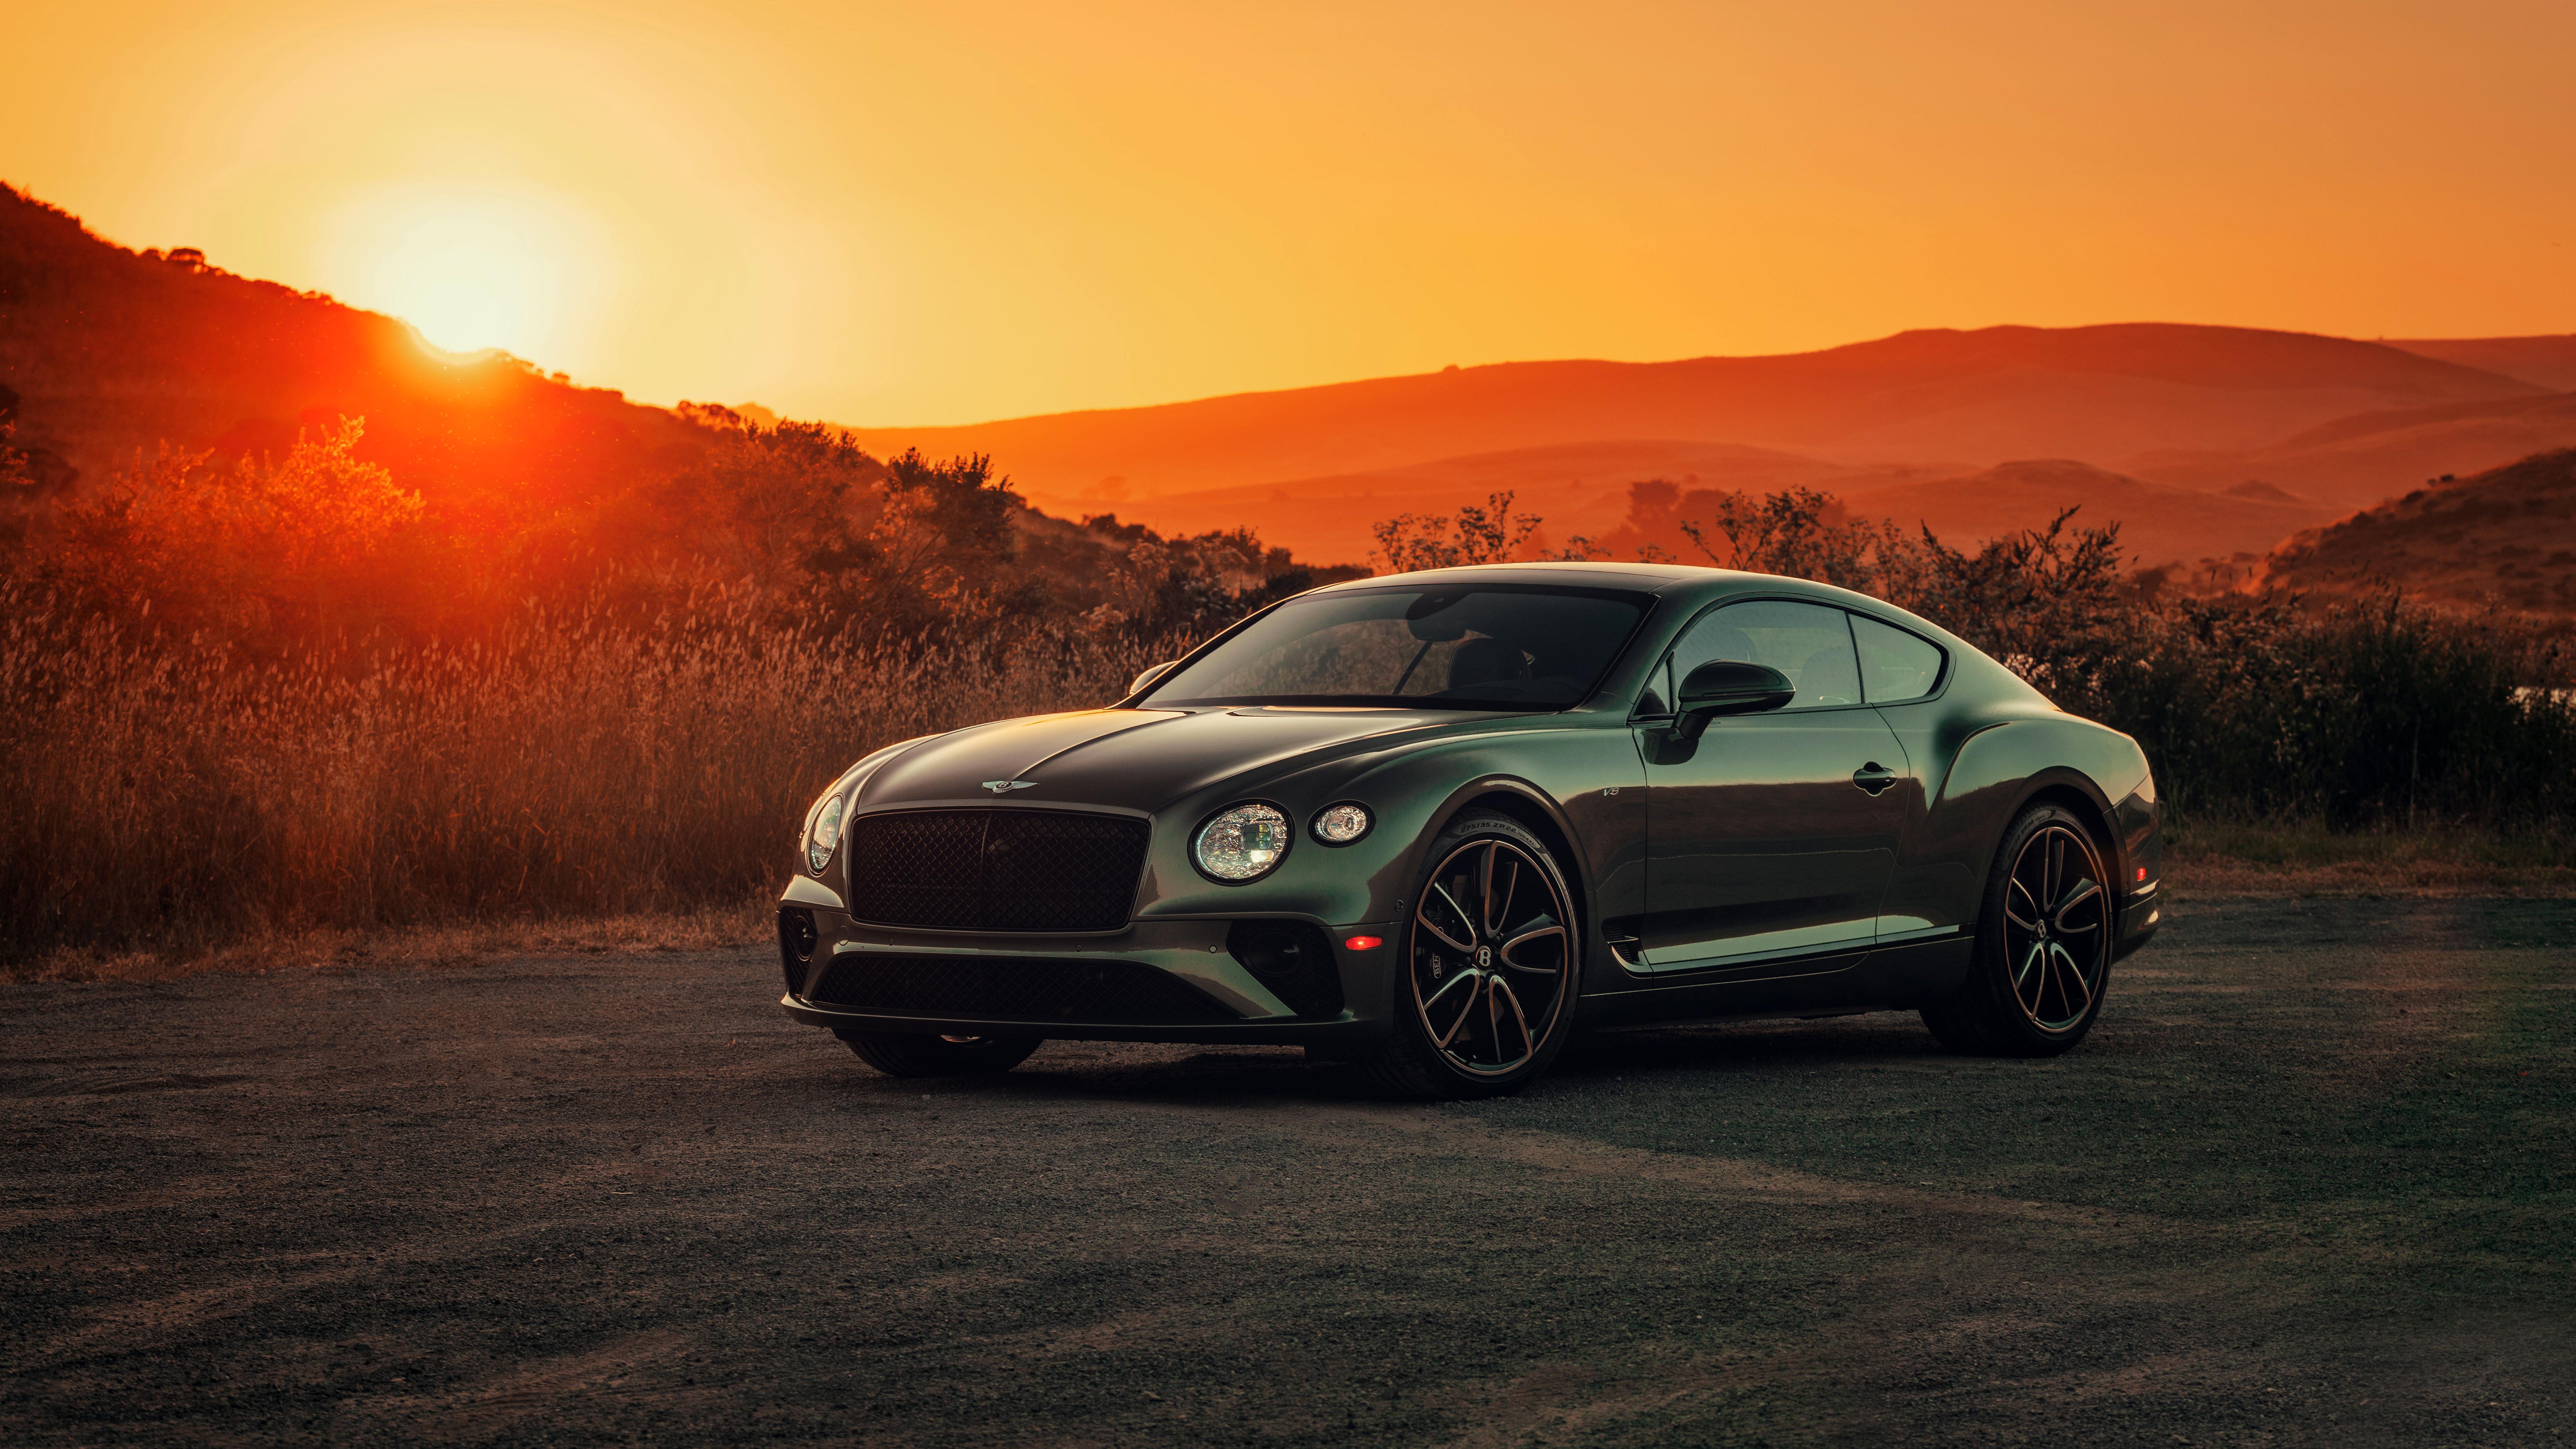 Bentley Continental Gt V8 8k Ultra Hd Wallpaper Hintergrund 7680x4320